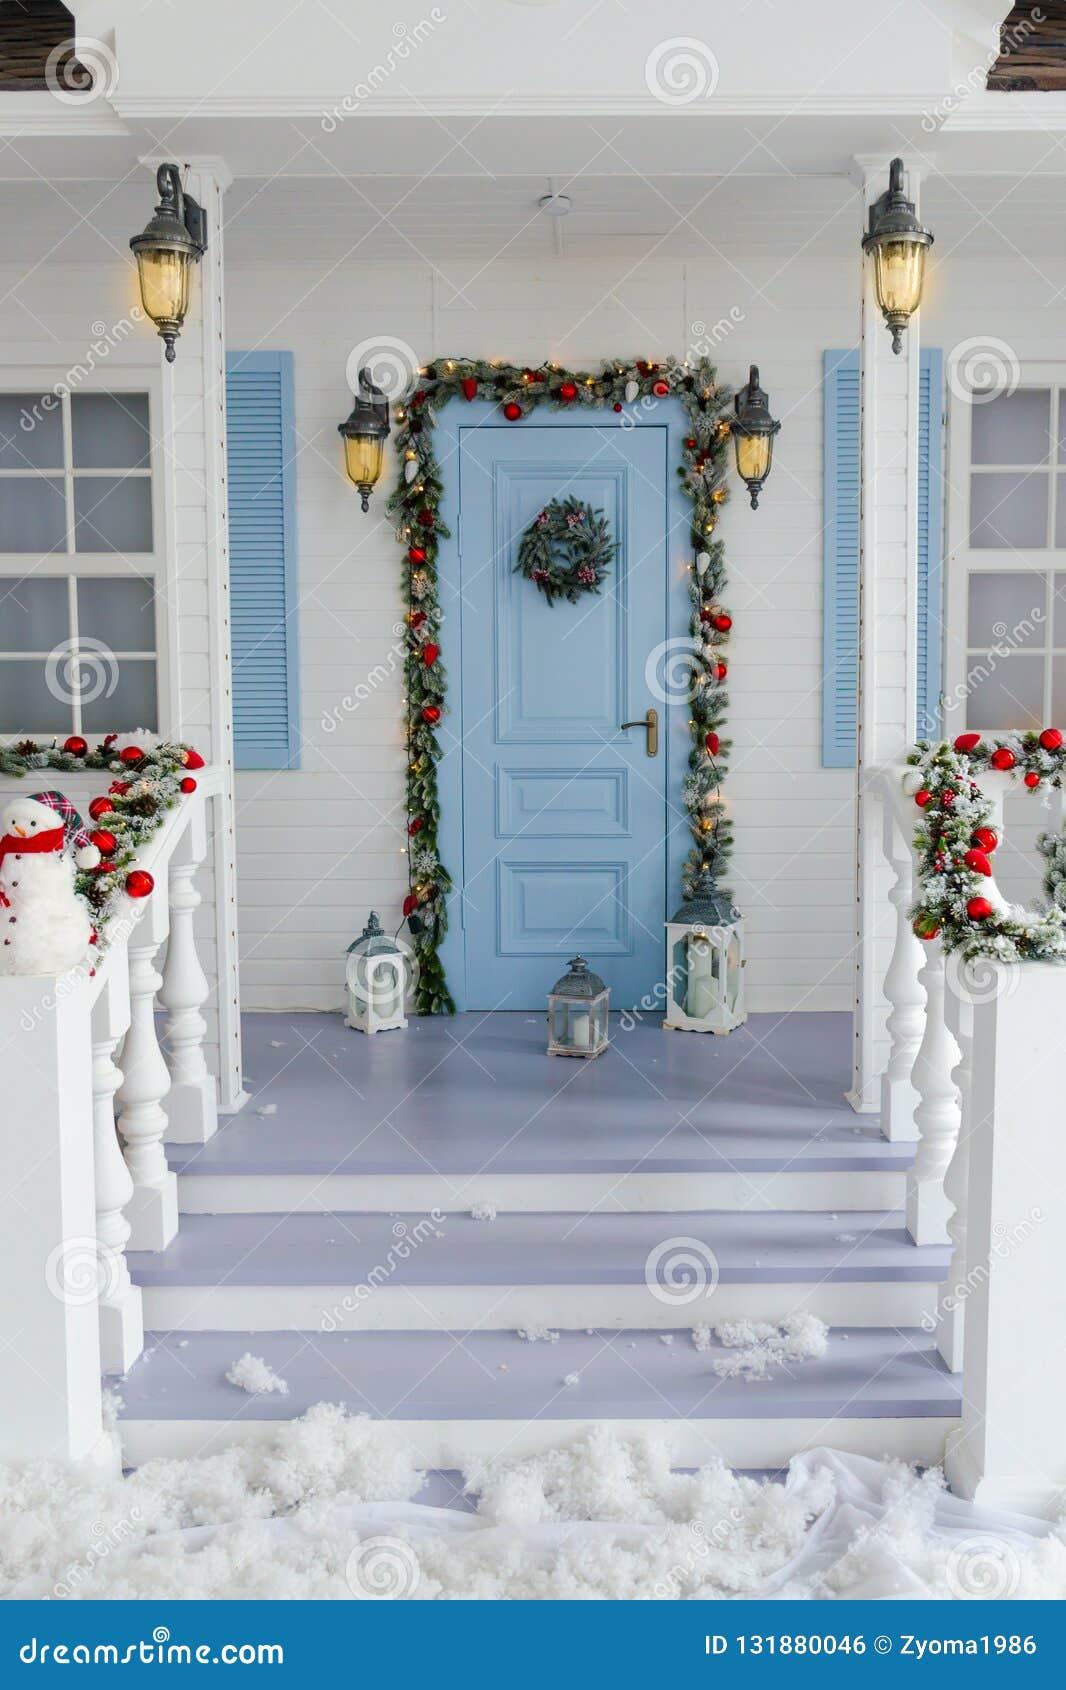 New Year Sweet Home Interior Design Decoration Stock Photo ...